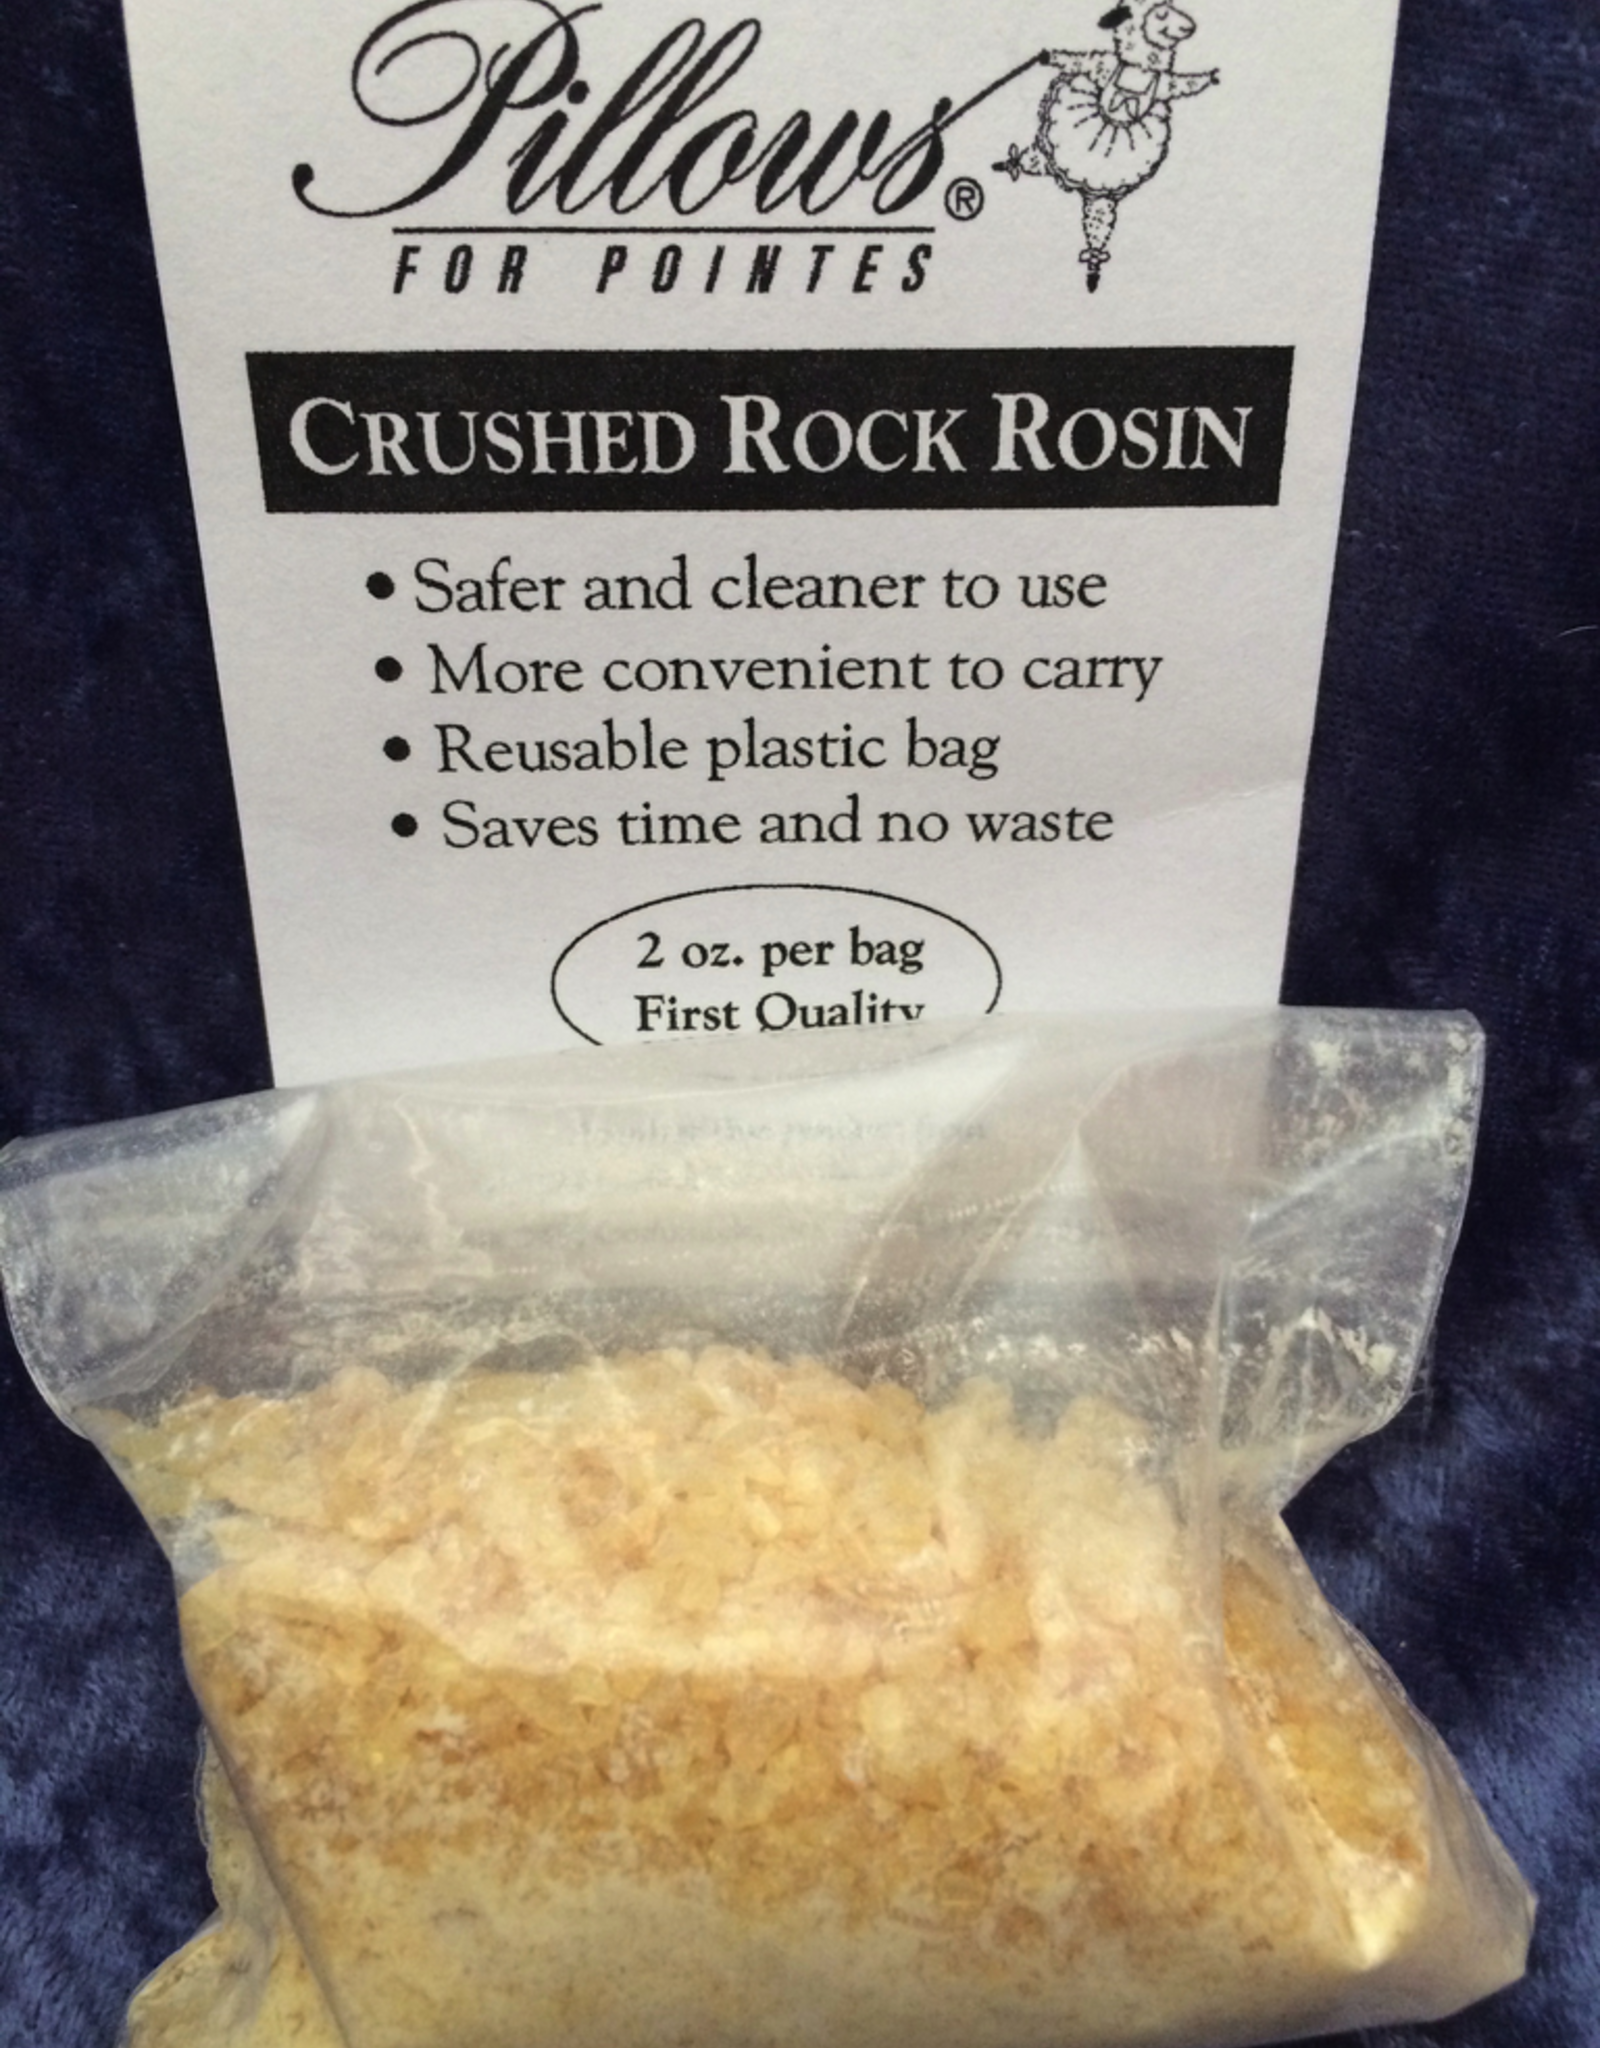 Pillows For Pointe Pocket Rock Rosin 2 oz.